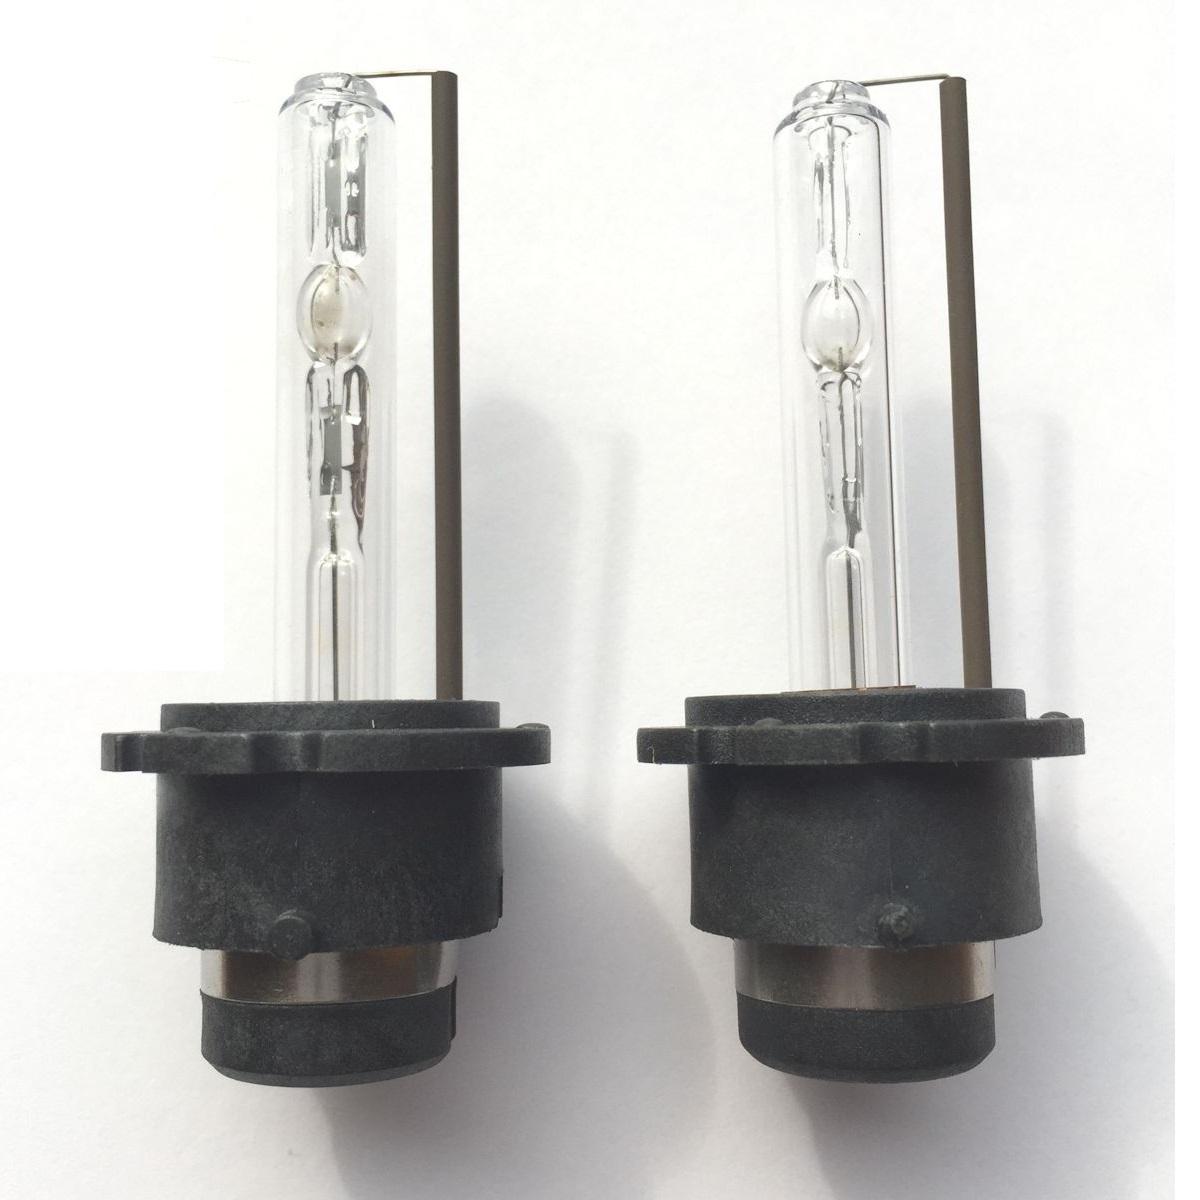 2x D2S 35W 8000K HID Xenon Bluish Replacement Low/High Beam Car Headlight Bulbs